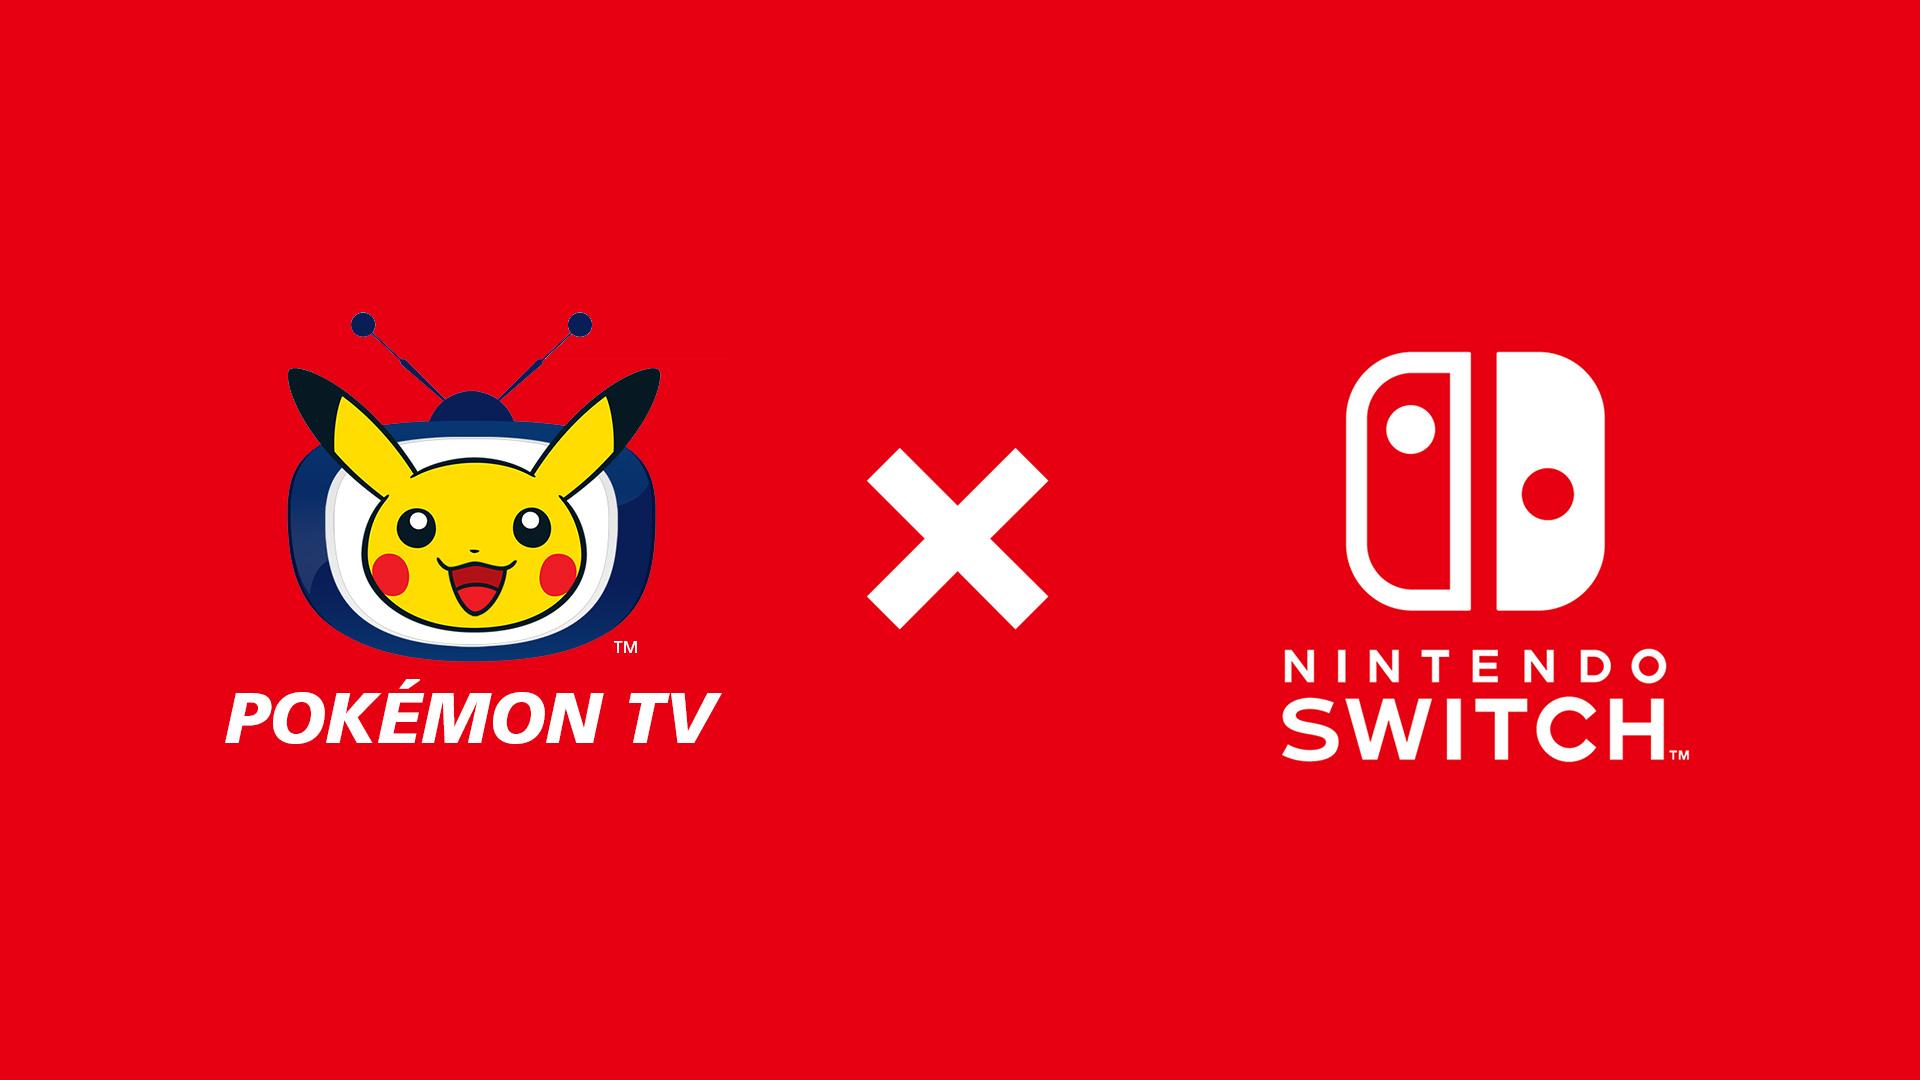 Pokemon TV and Switch logos